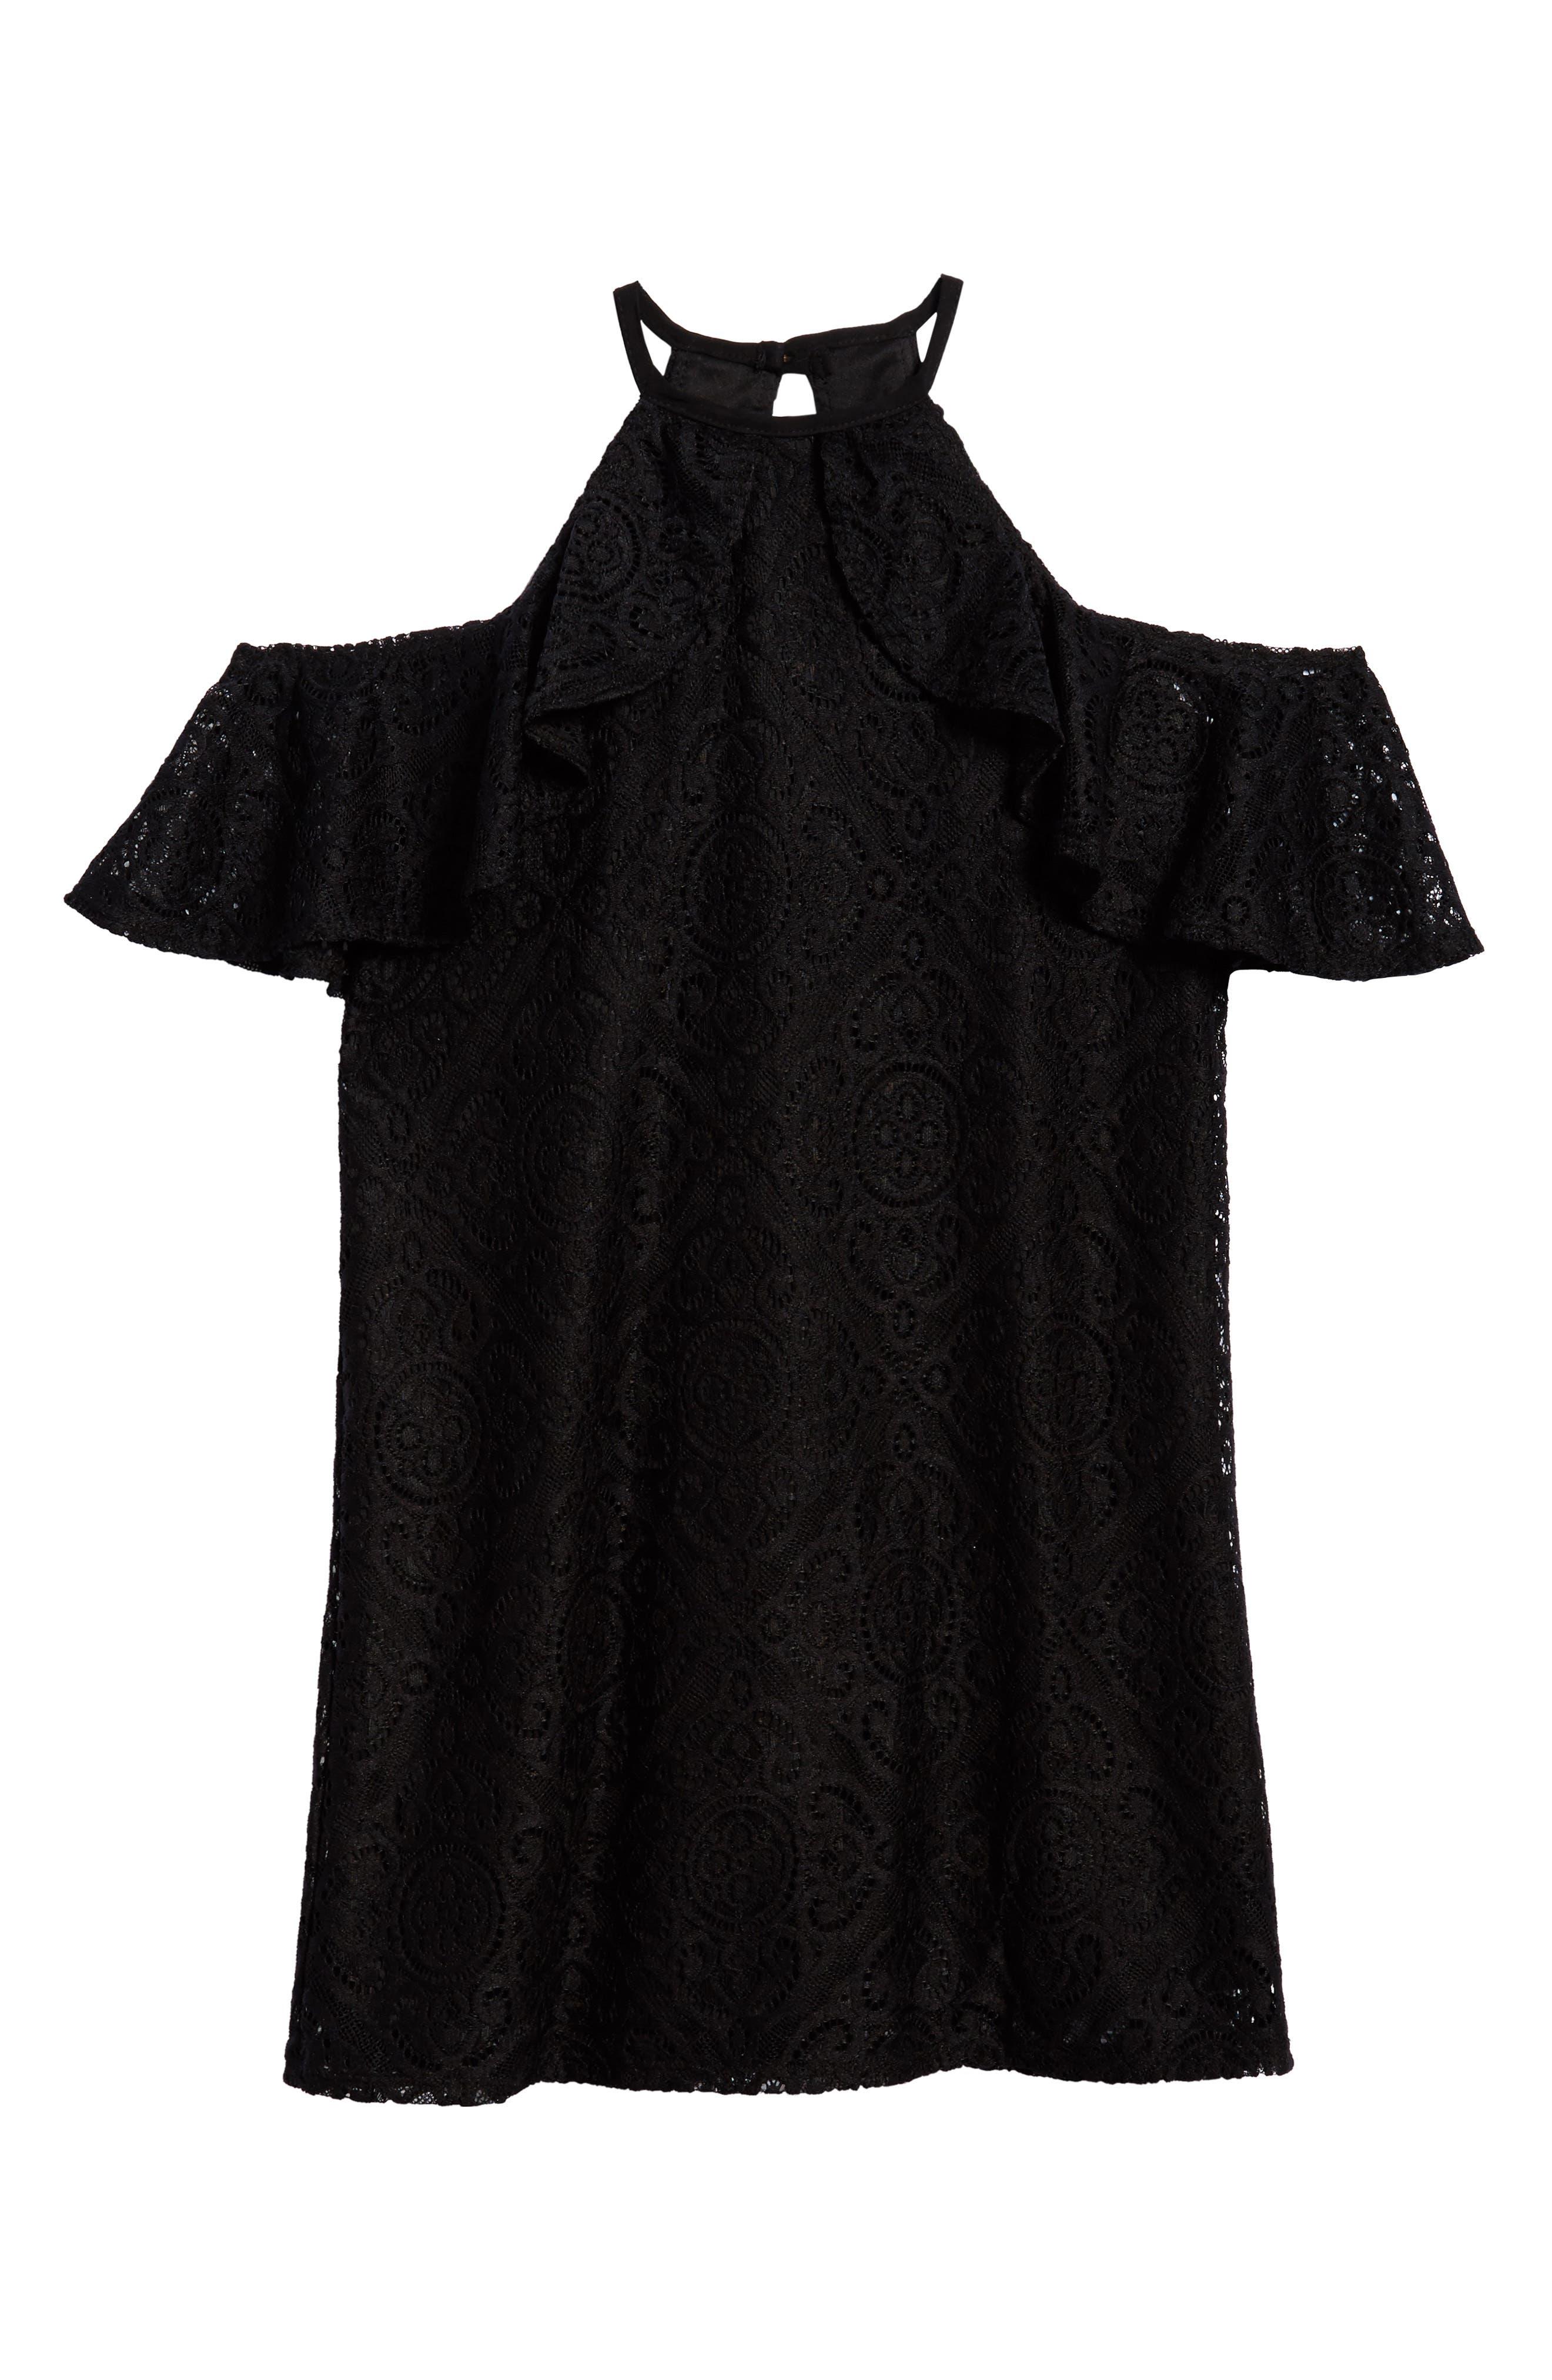 Lace Ruffle Cold Shoulder Dress,                             Main thumbnail 1, color,                             001